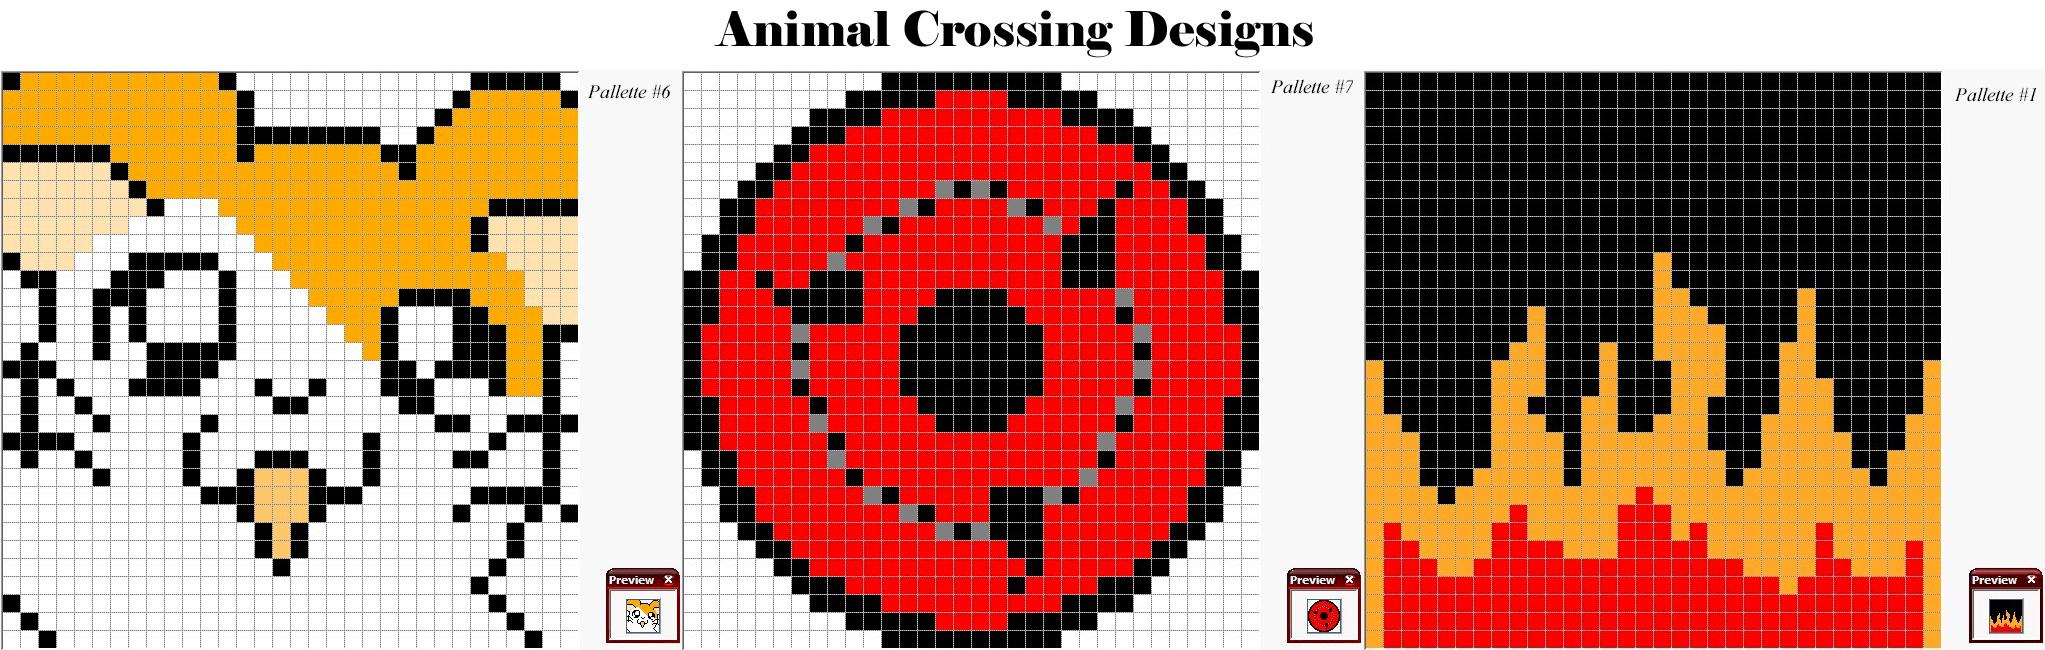 Animal Crossing Patterns By Shadokin77 On Deviantart